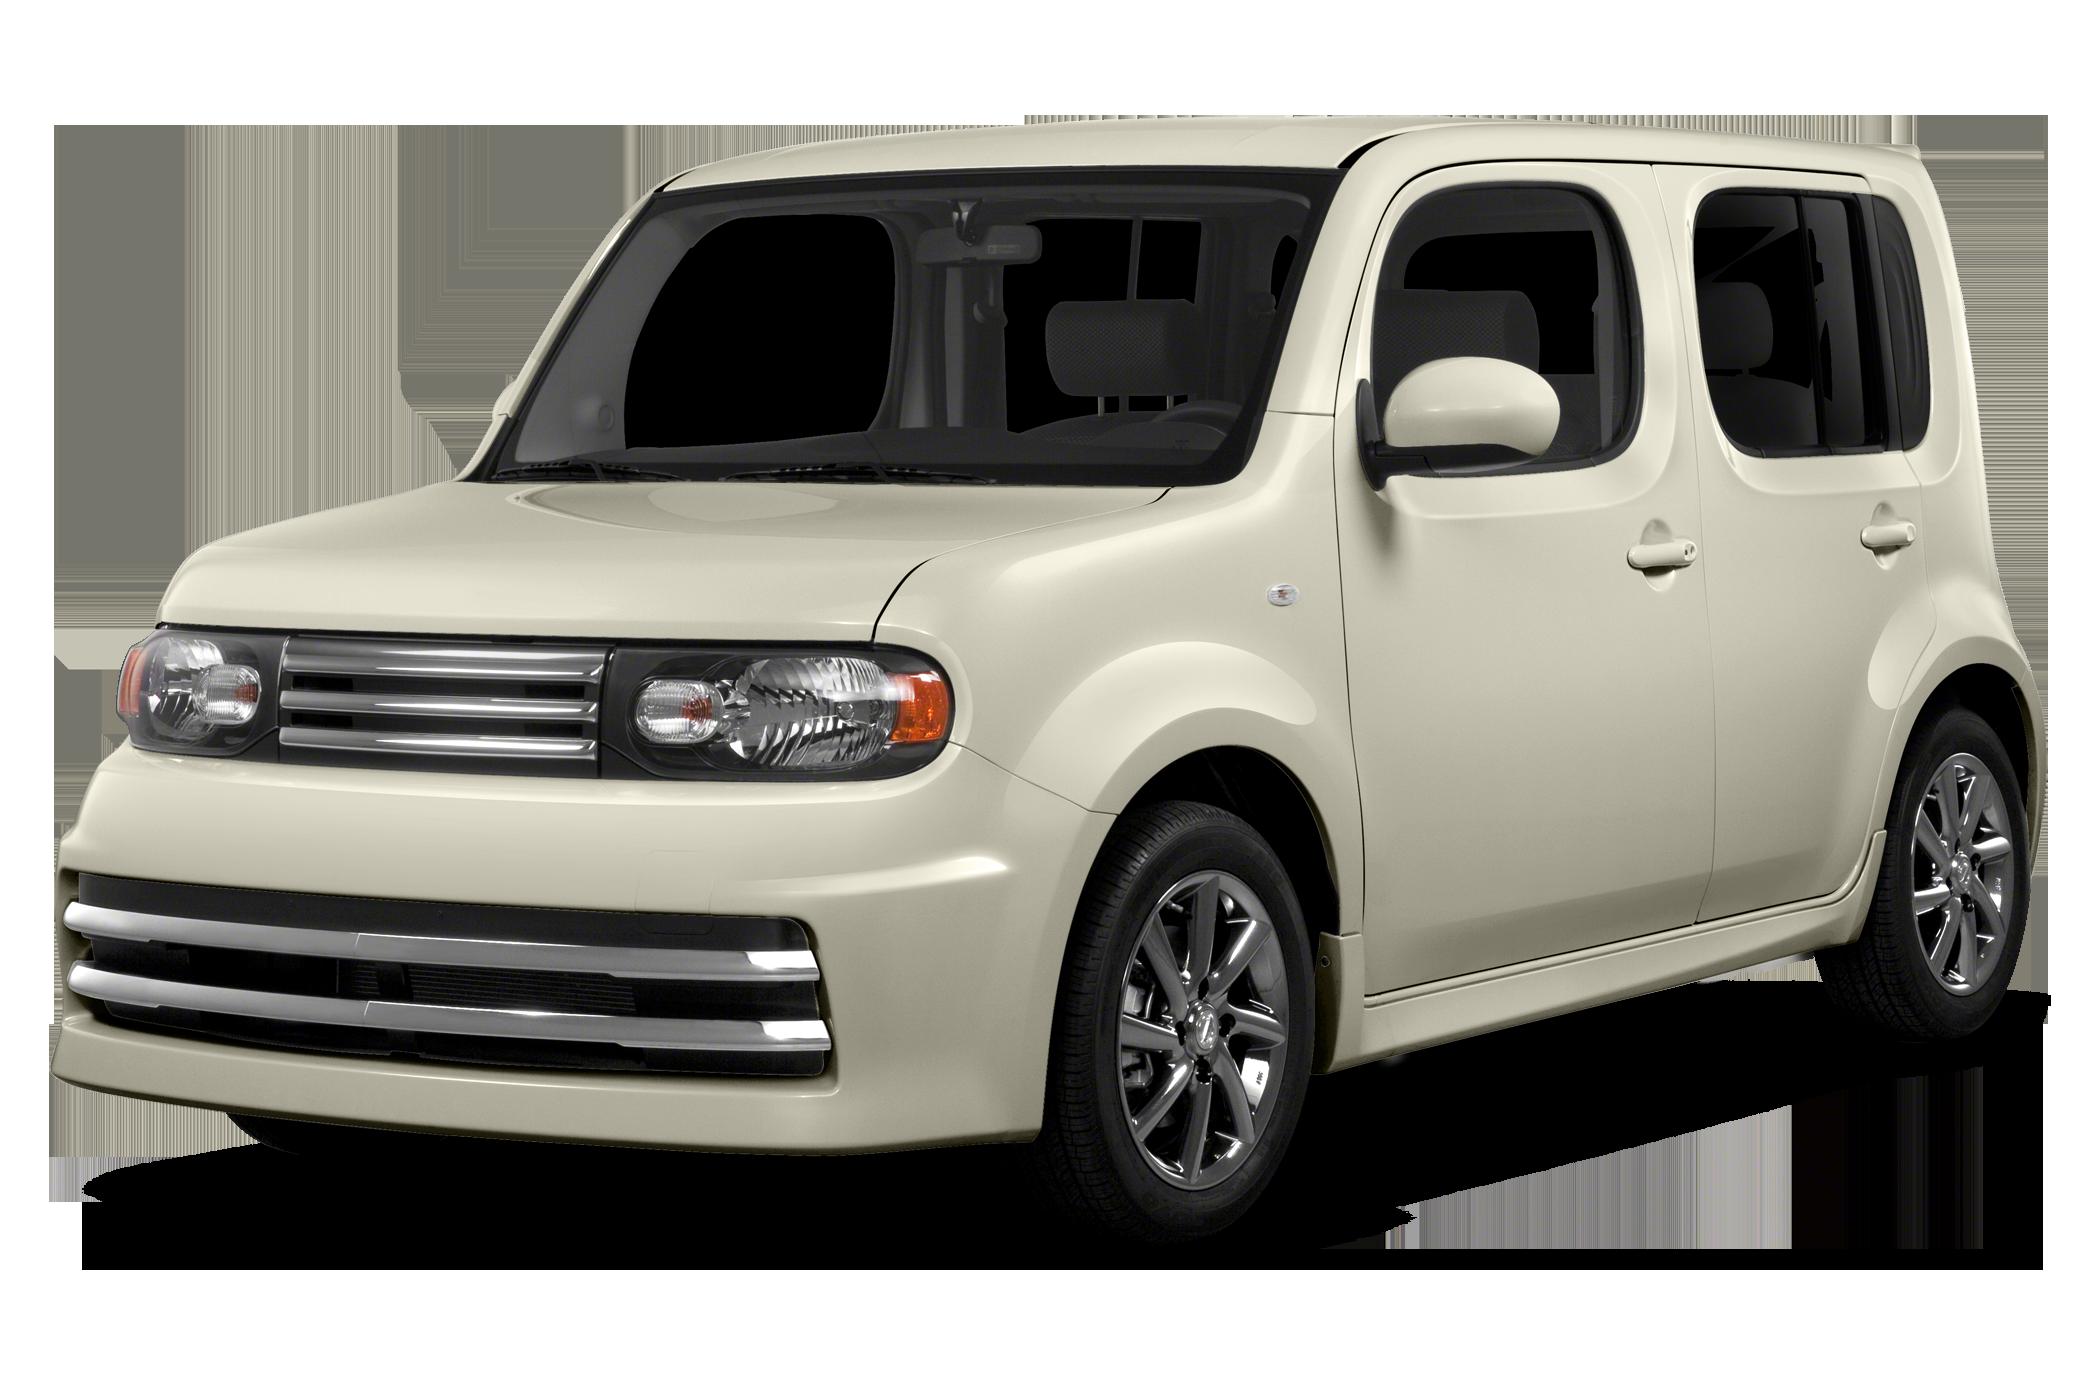 My Car Comparison - CarsDirect.com